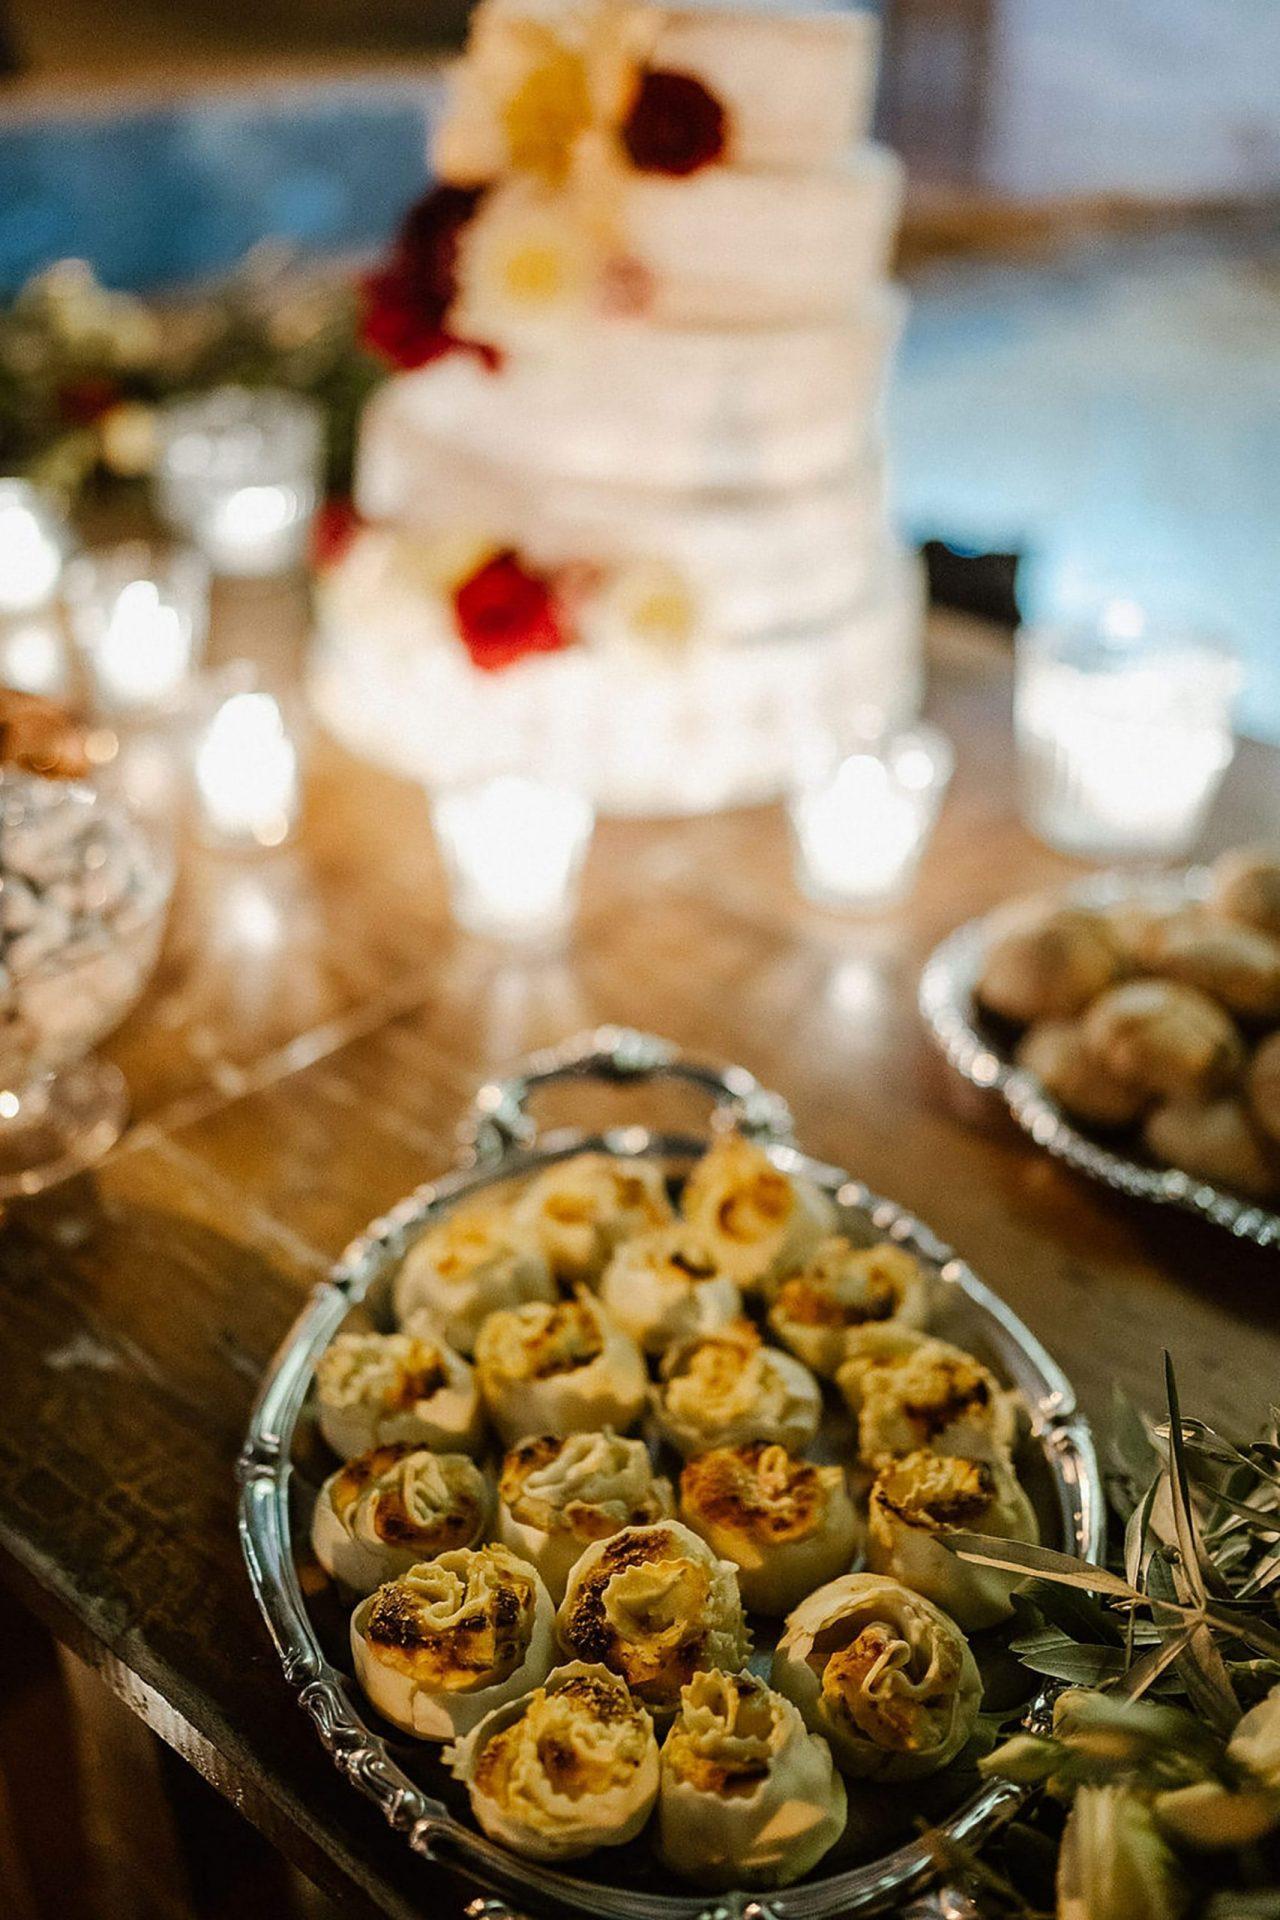 Marianna & Matteo, traditional Sardinian sweet table